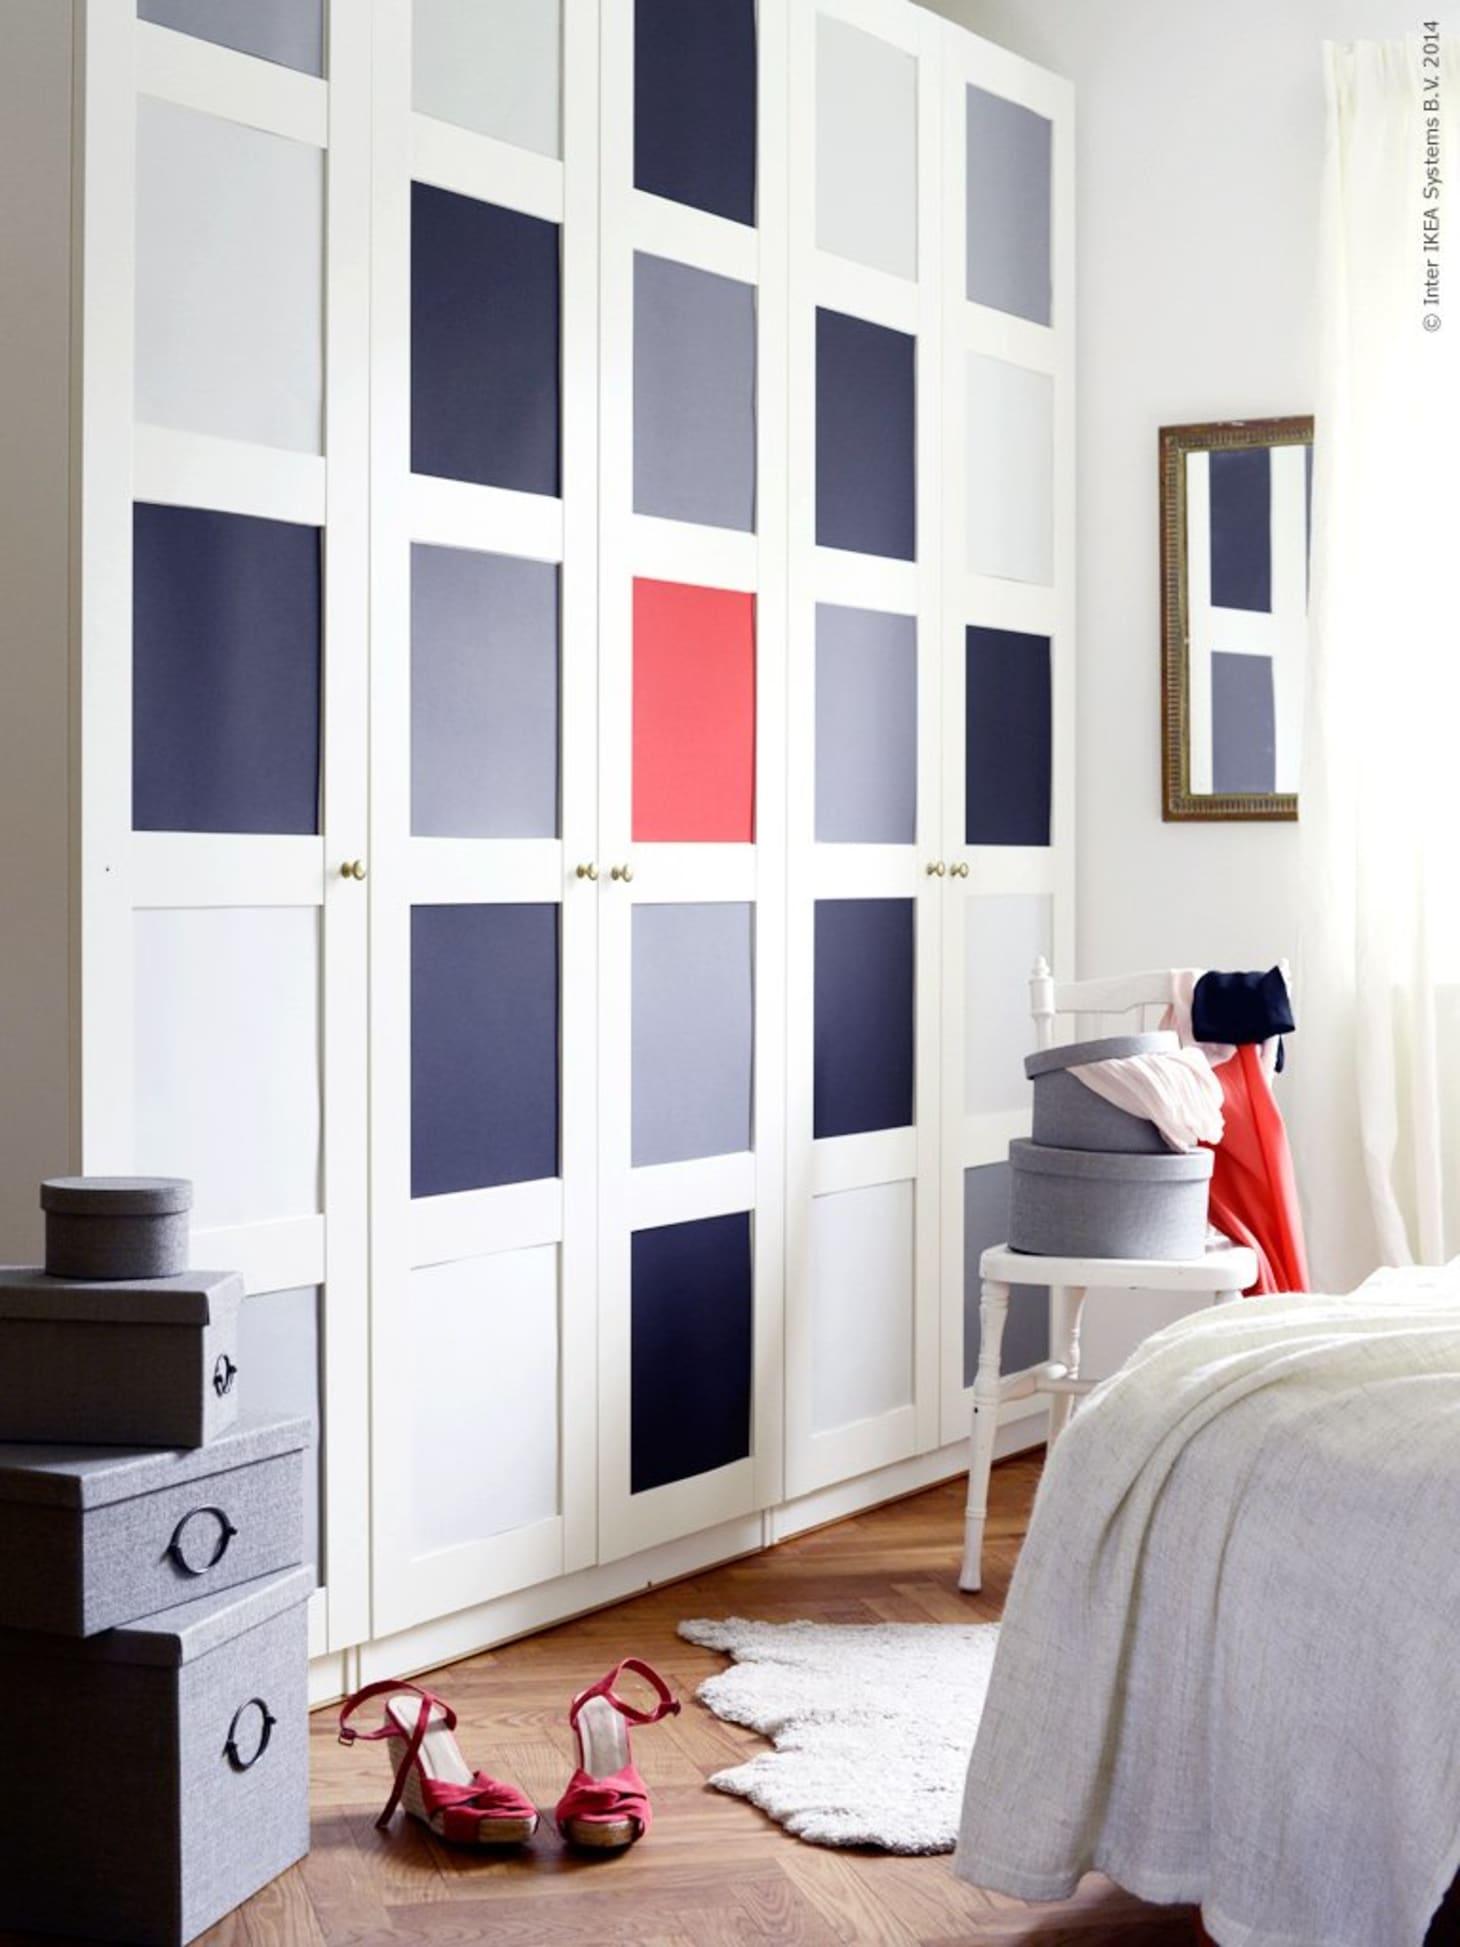 Ikea Hacks Diy Ways To Make Cheap Wardrobes Look More